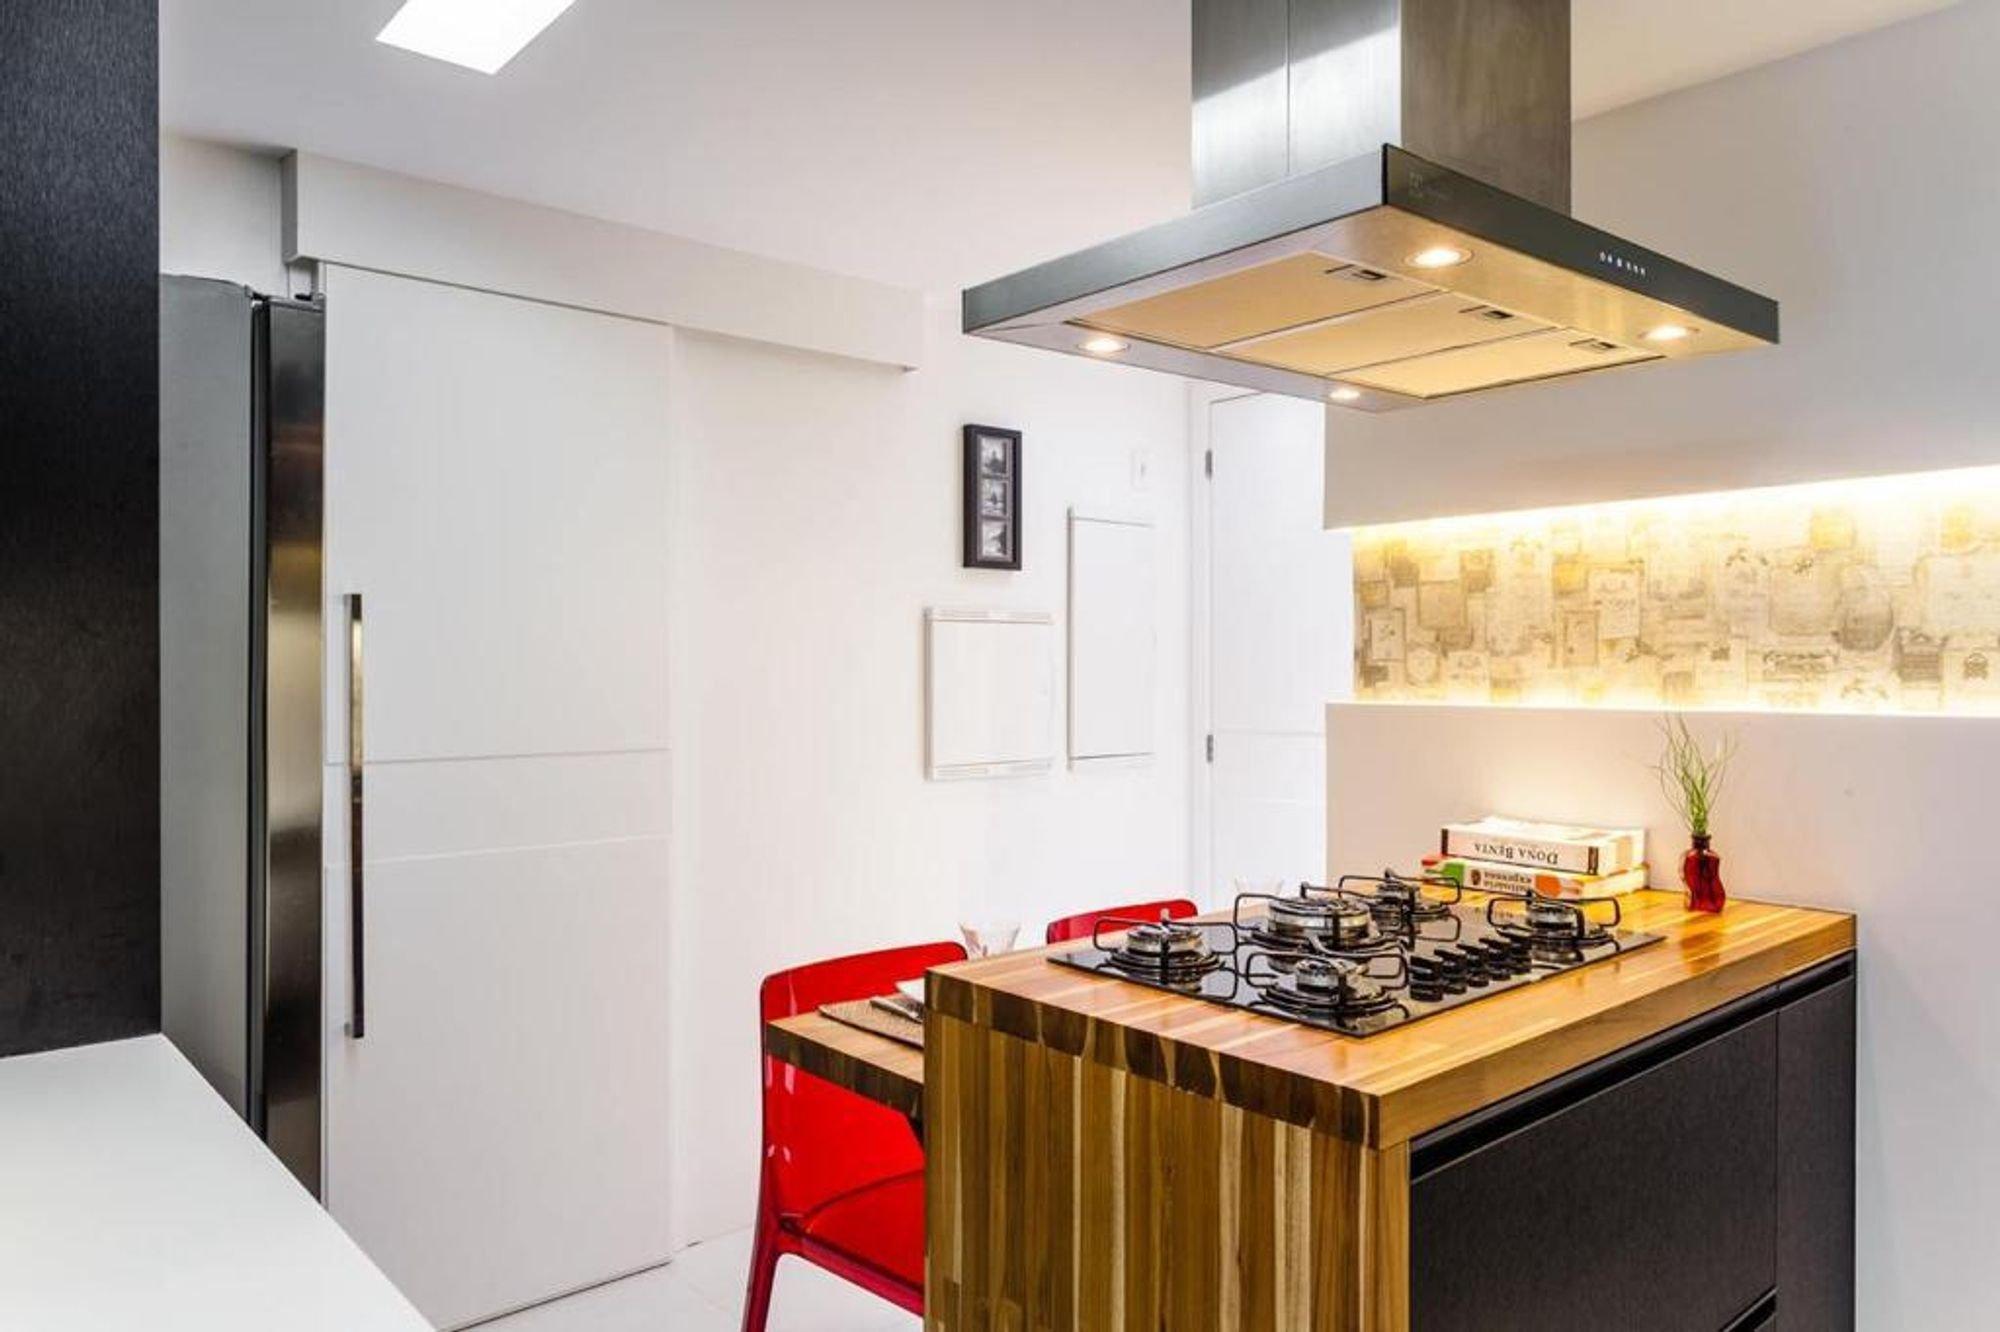 Foto de Cozinha com mesa de jantar